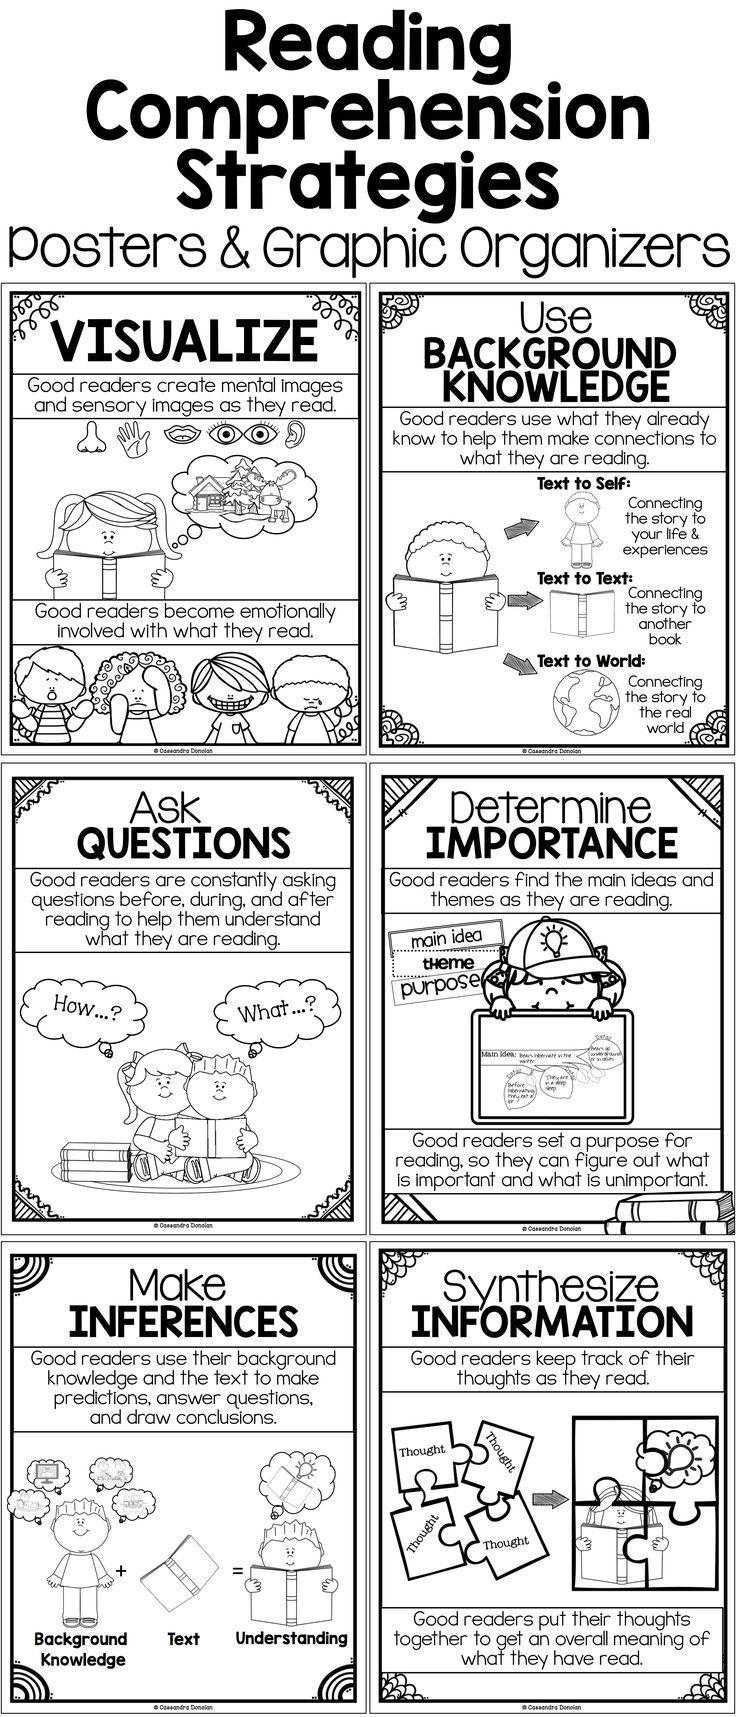 Reading Comprehension Strategies Posters \u0026 Graphic Organizers [ 1717 x 736 Pixel ]